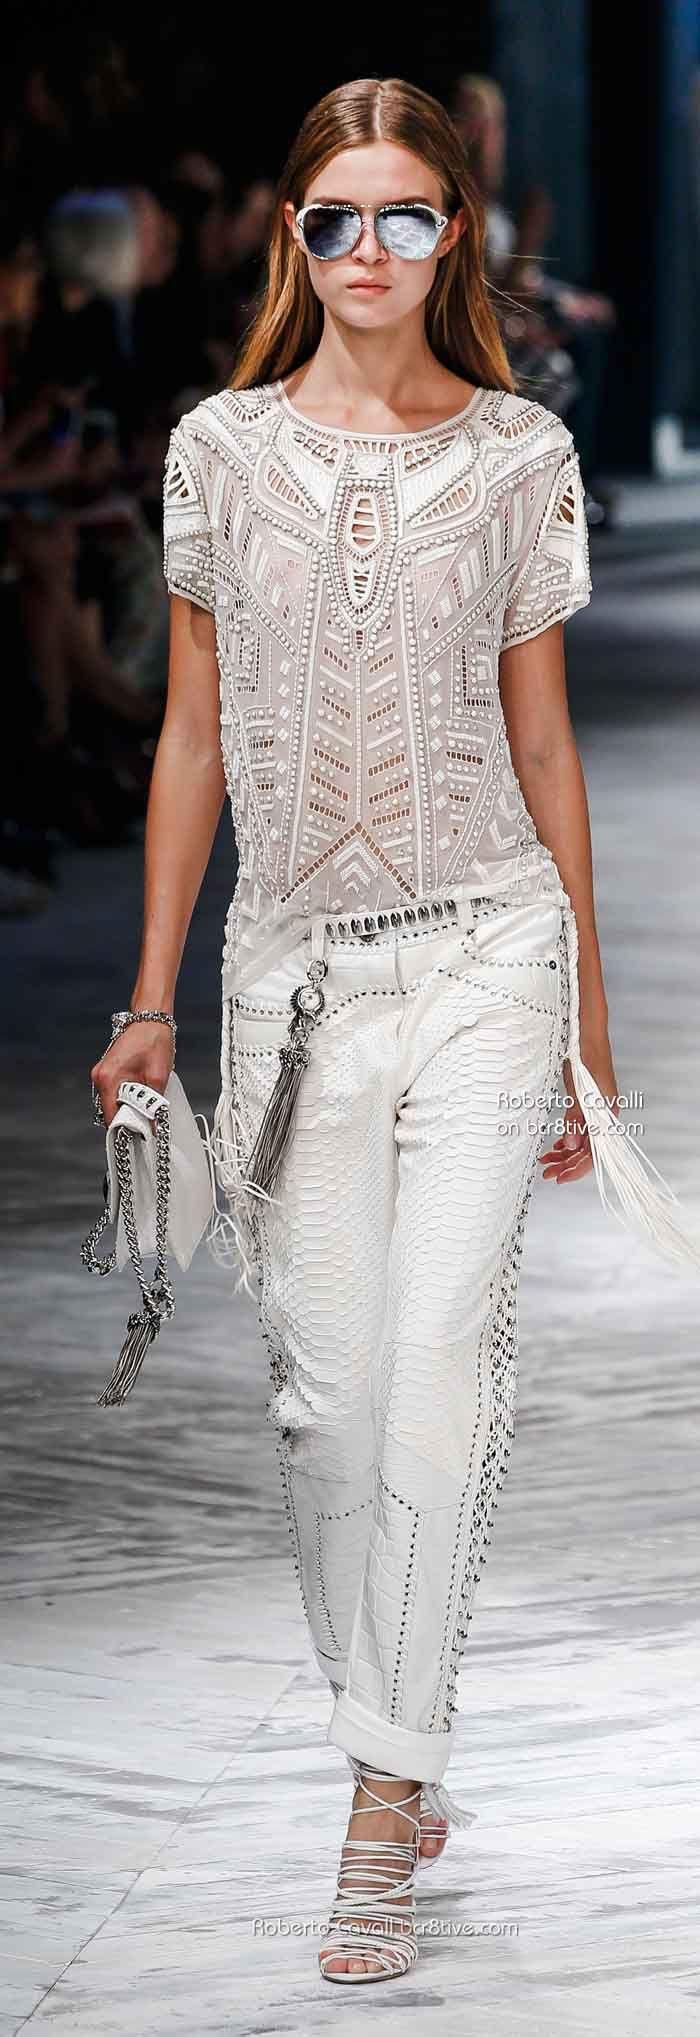 Roberto Cavalli Spring 2014, #fashion , #designerfashion, #Spring2014